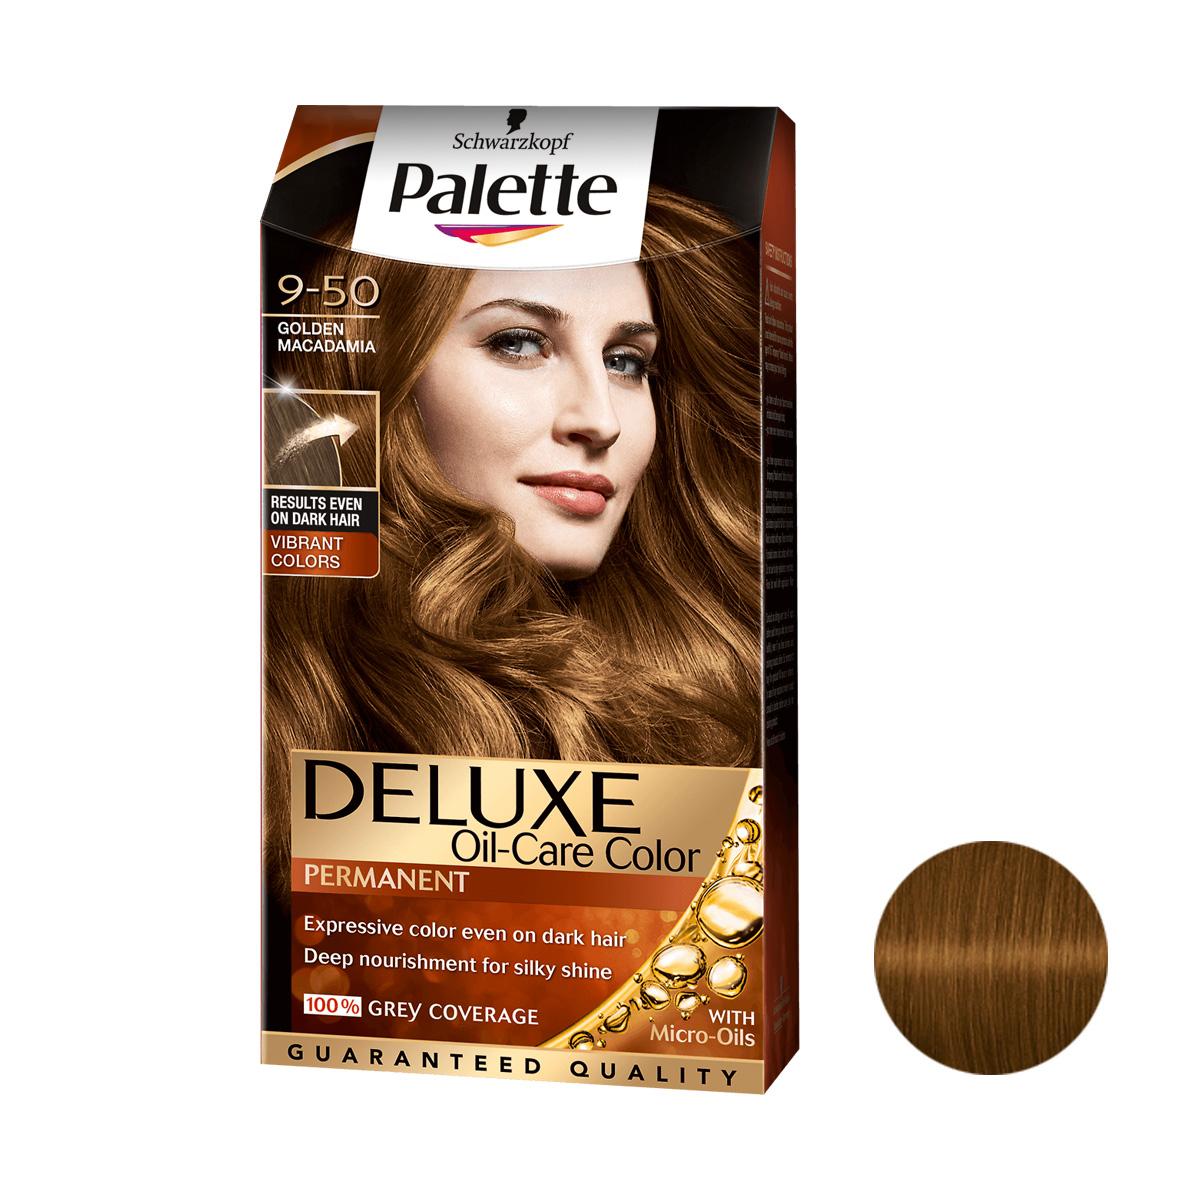 کیت رنگ مو پلت سری DELUXE شماره 50-9 حجم 50 میلی لیتر رنگ فندقی طلایی